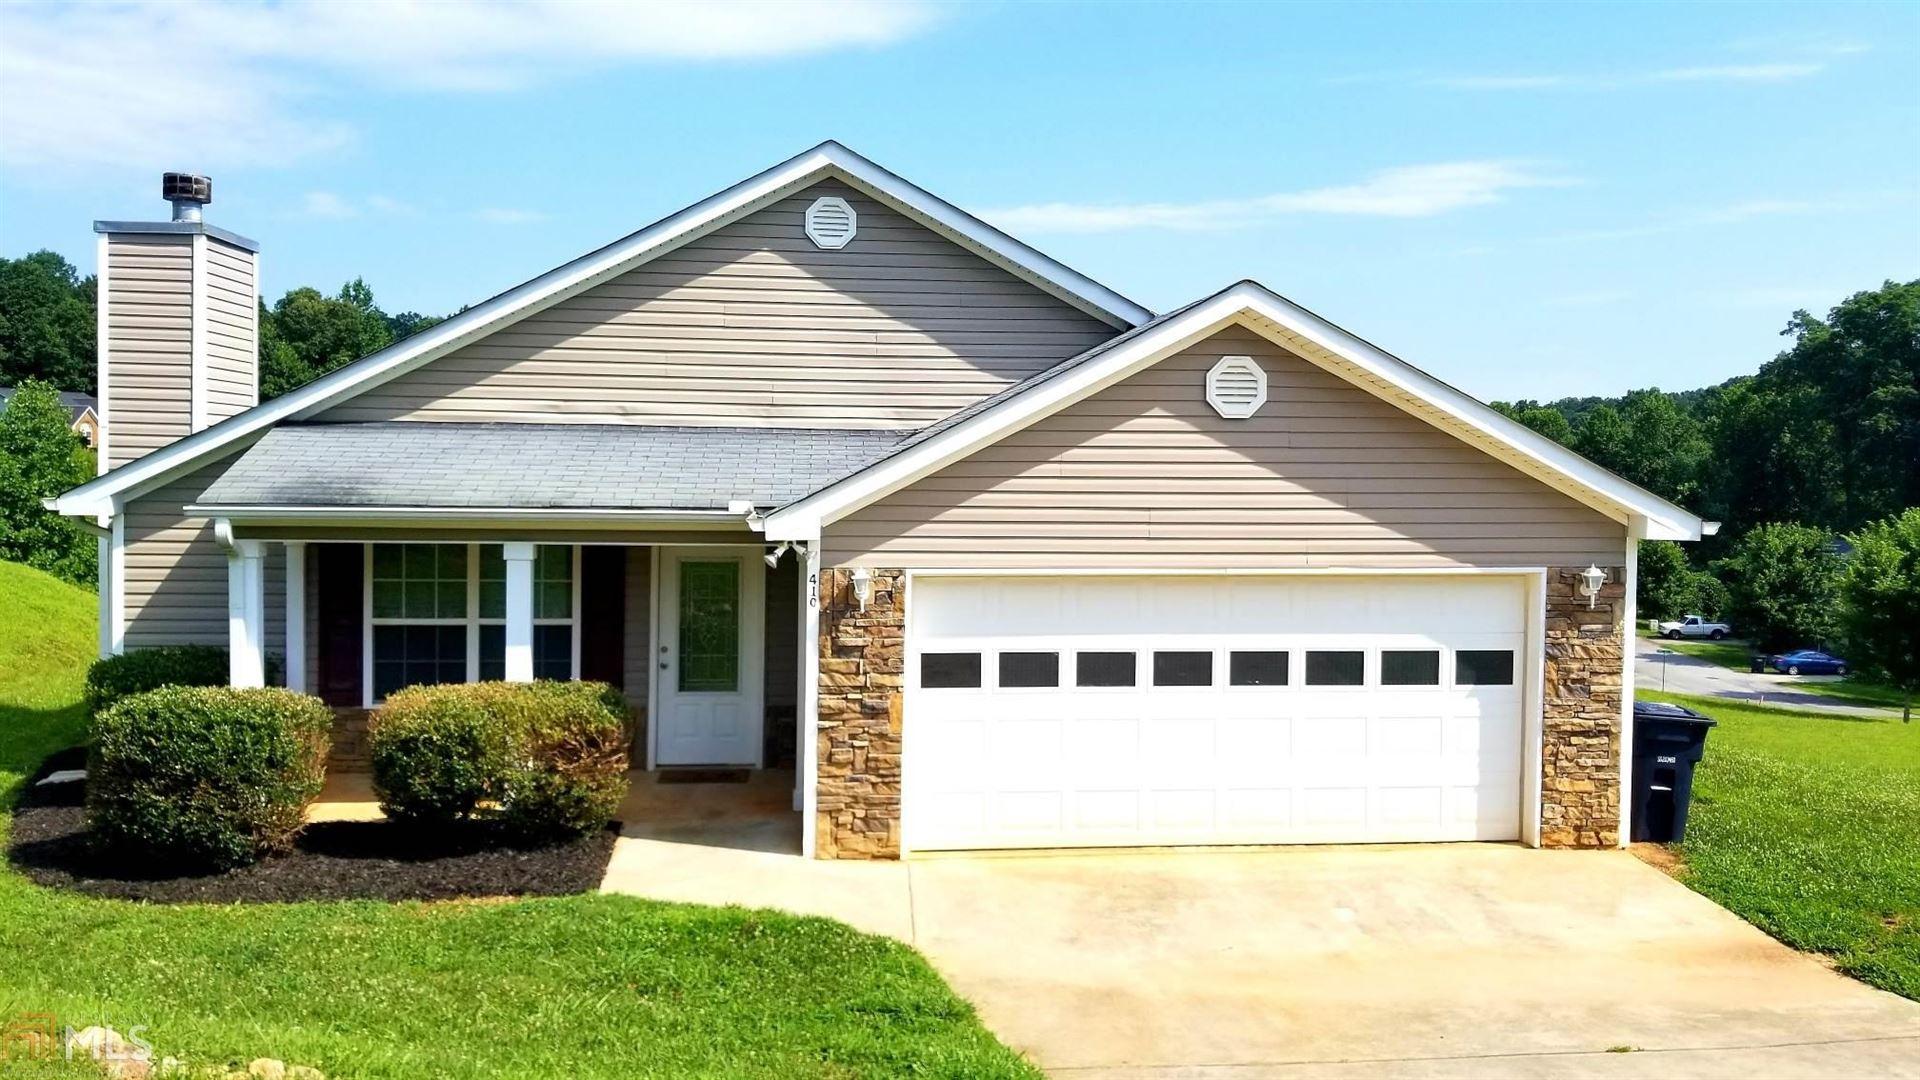 410 Spiral Hills Dr, Demorest, GA 30535 - MLS#: 8822062